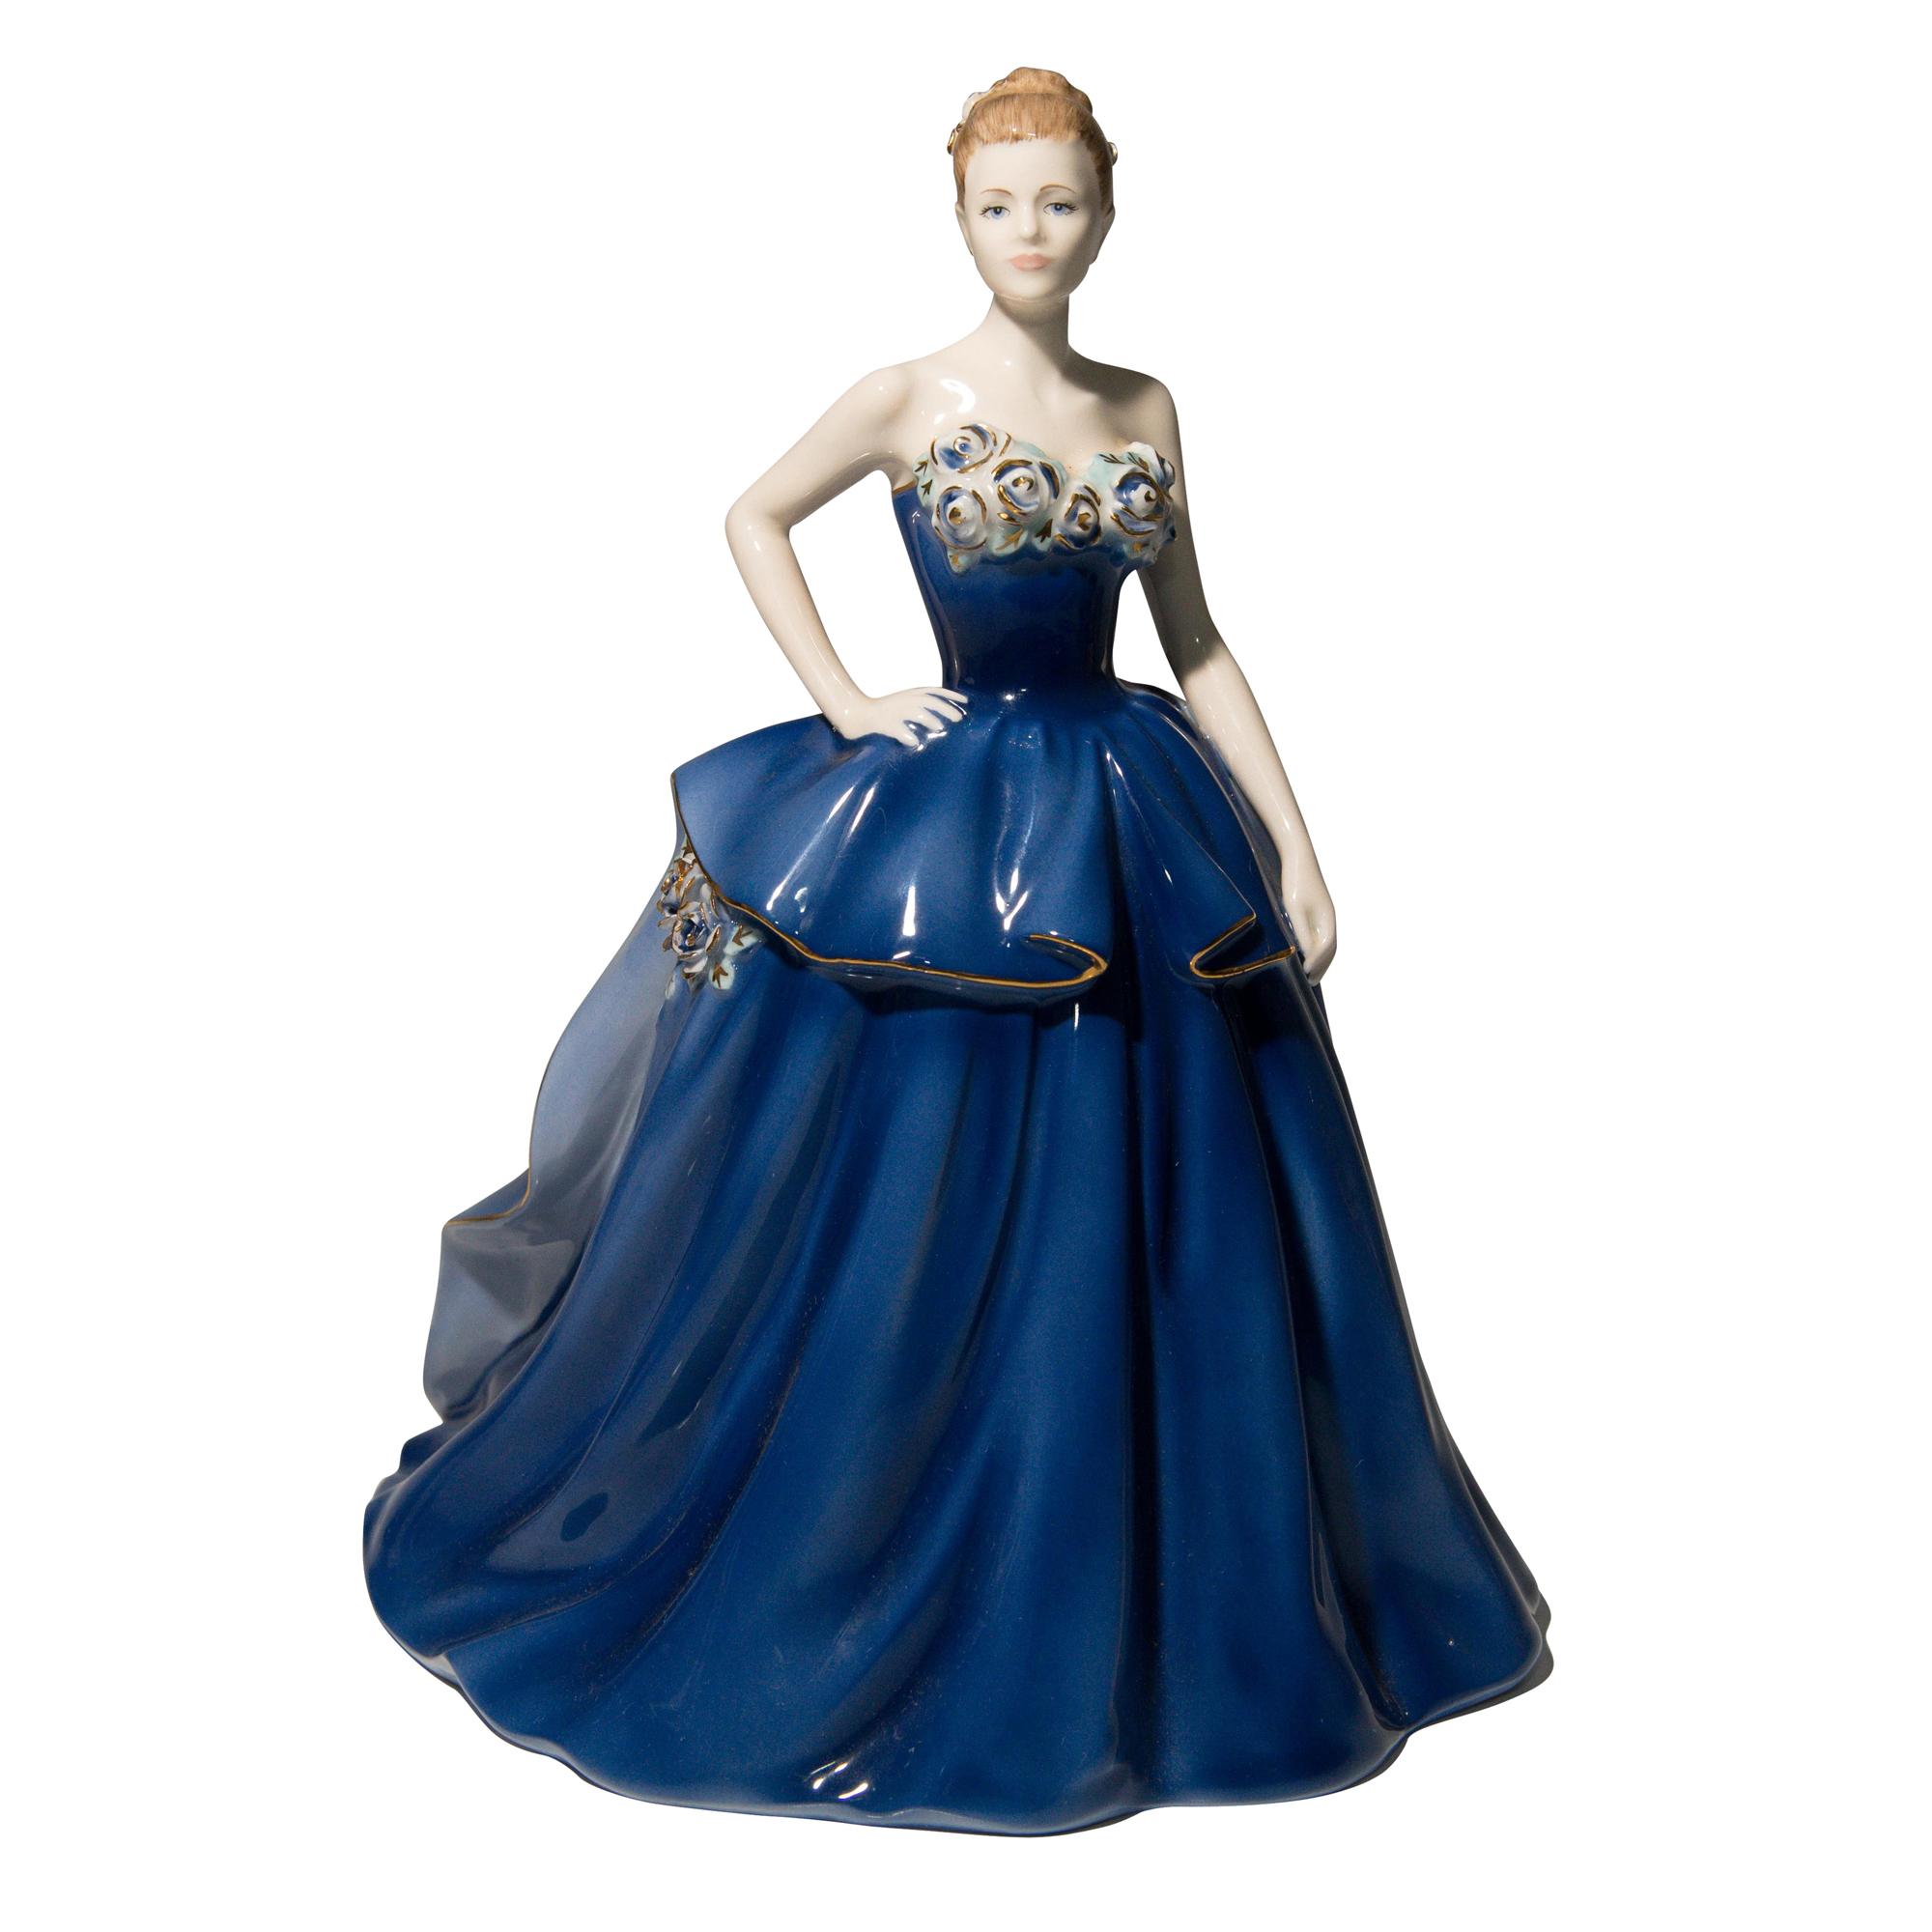 Jubilee Ball CW585 Coalport Figurine